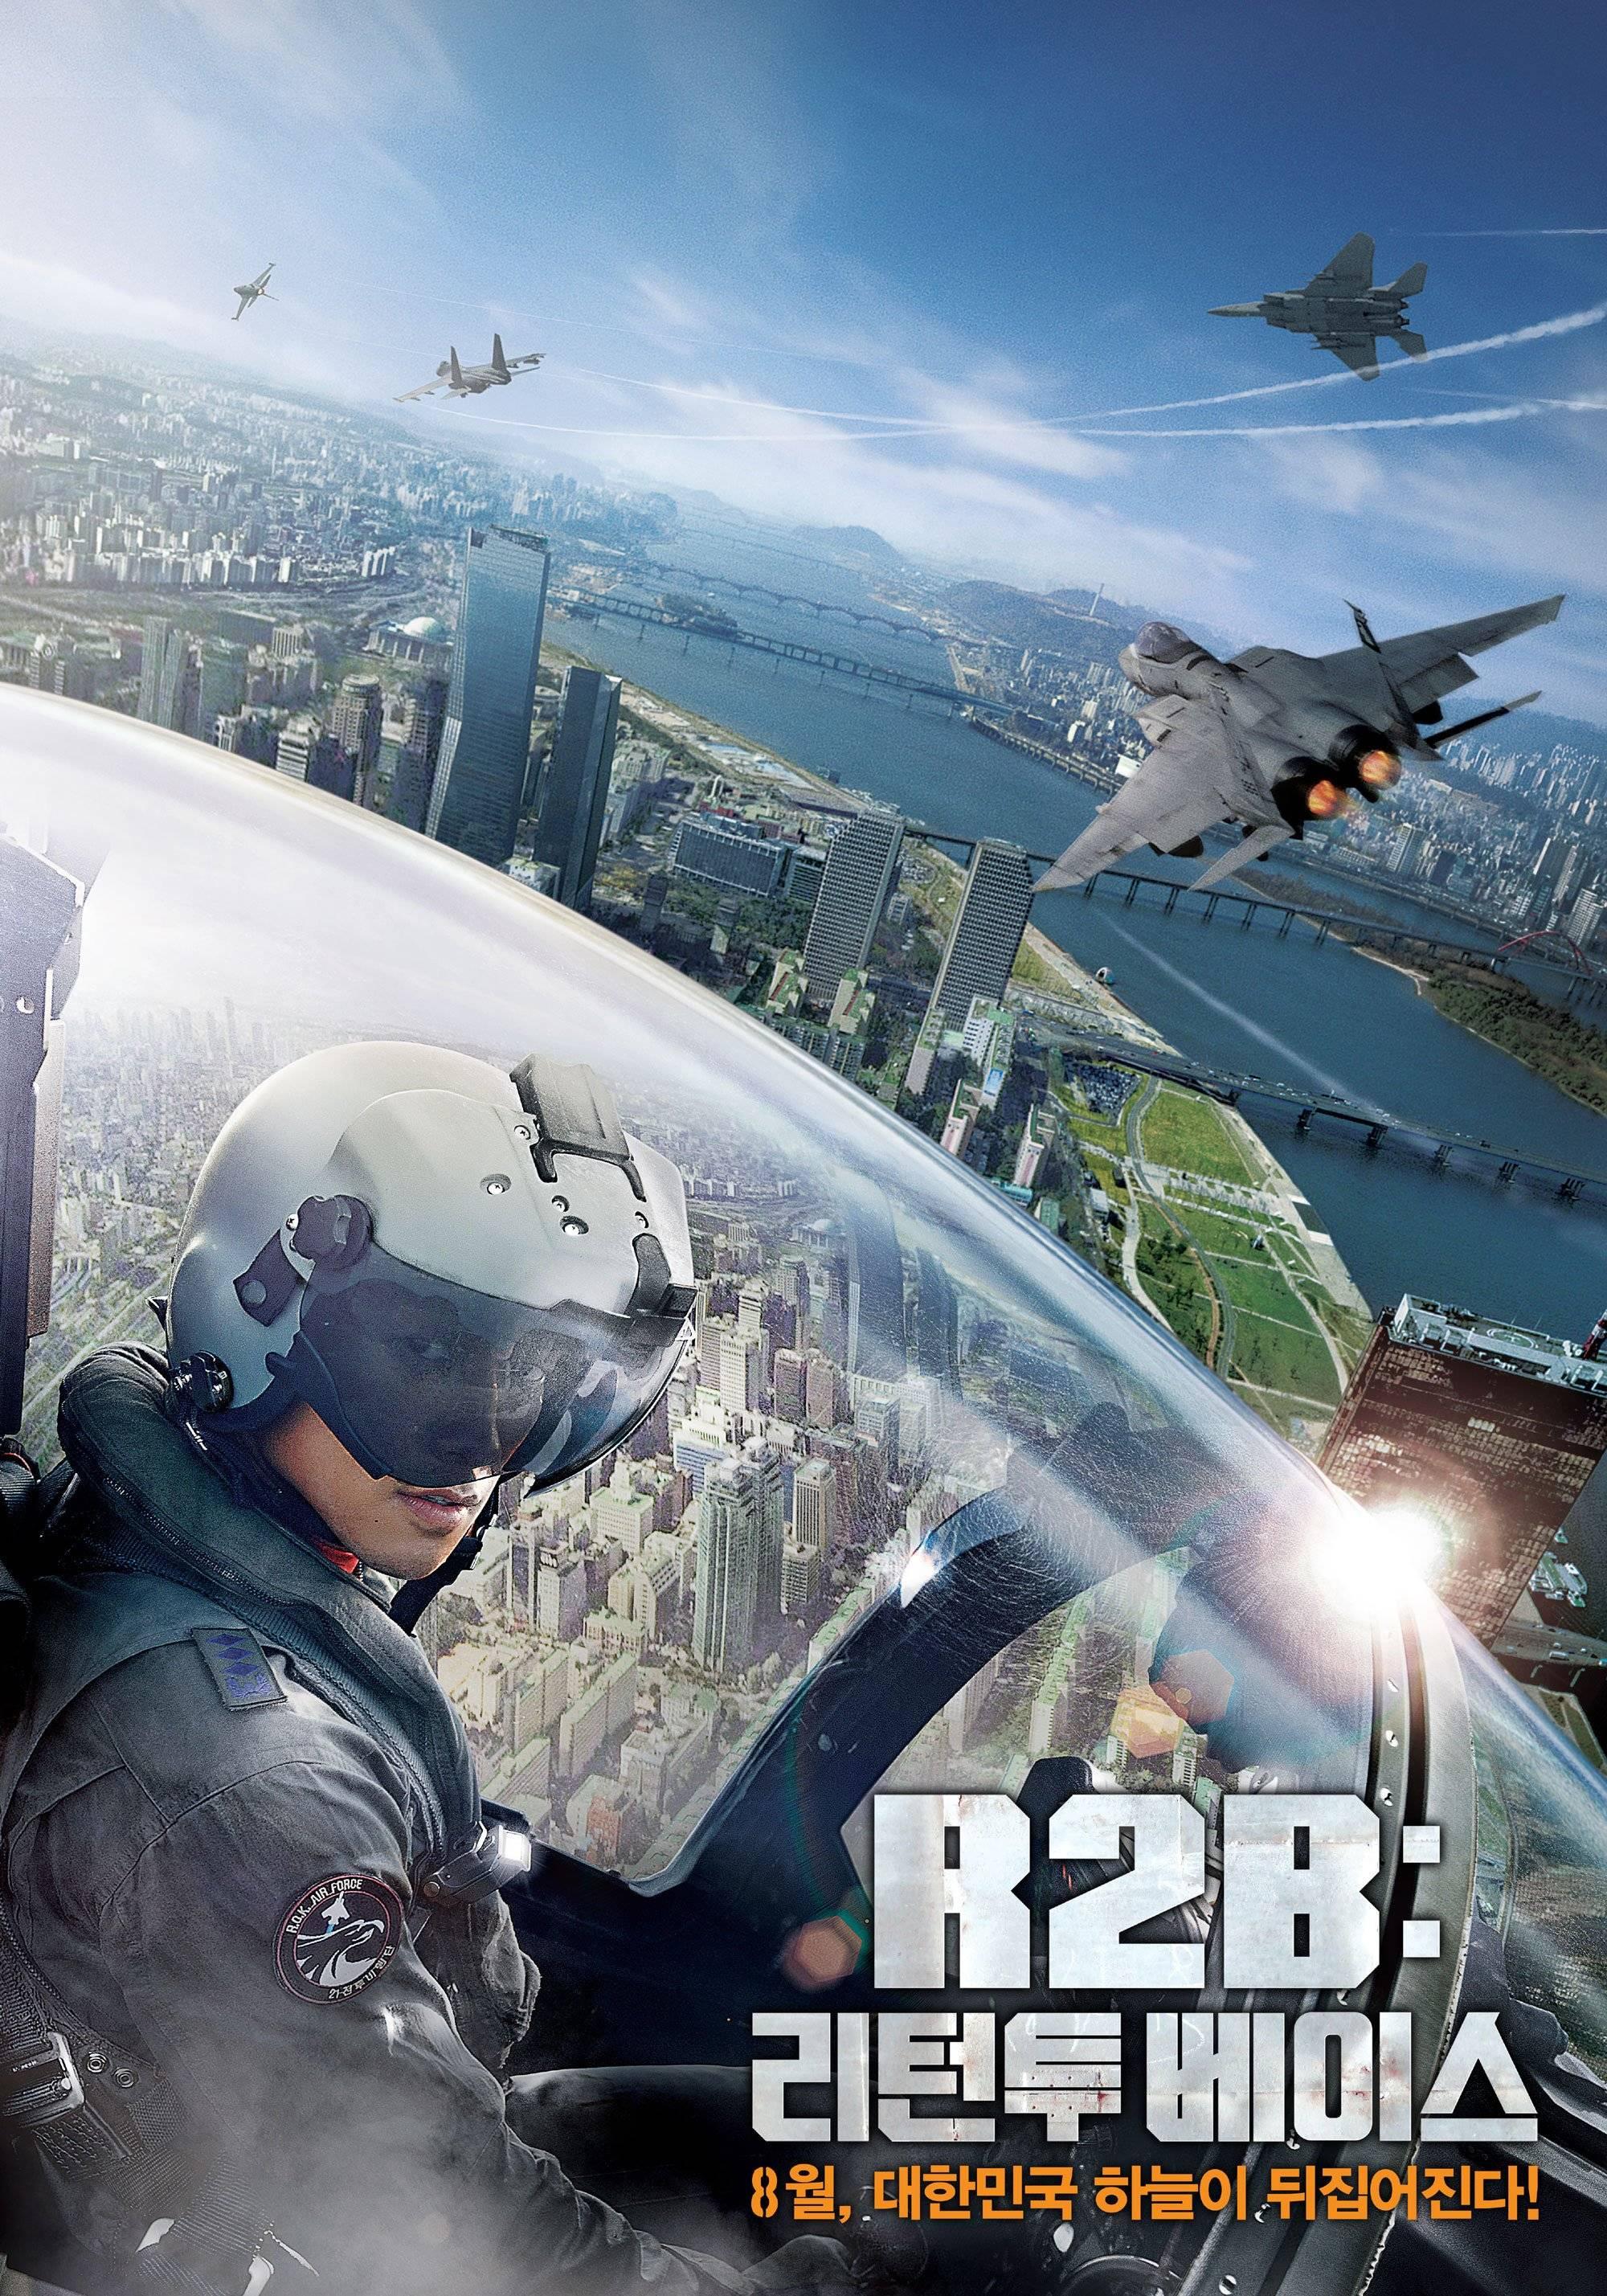 R2B: Return to Base (알투비:리턴투베이스) - Movie - Picture Gallery